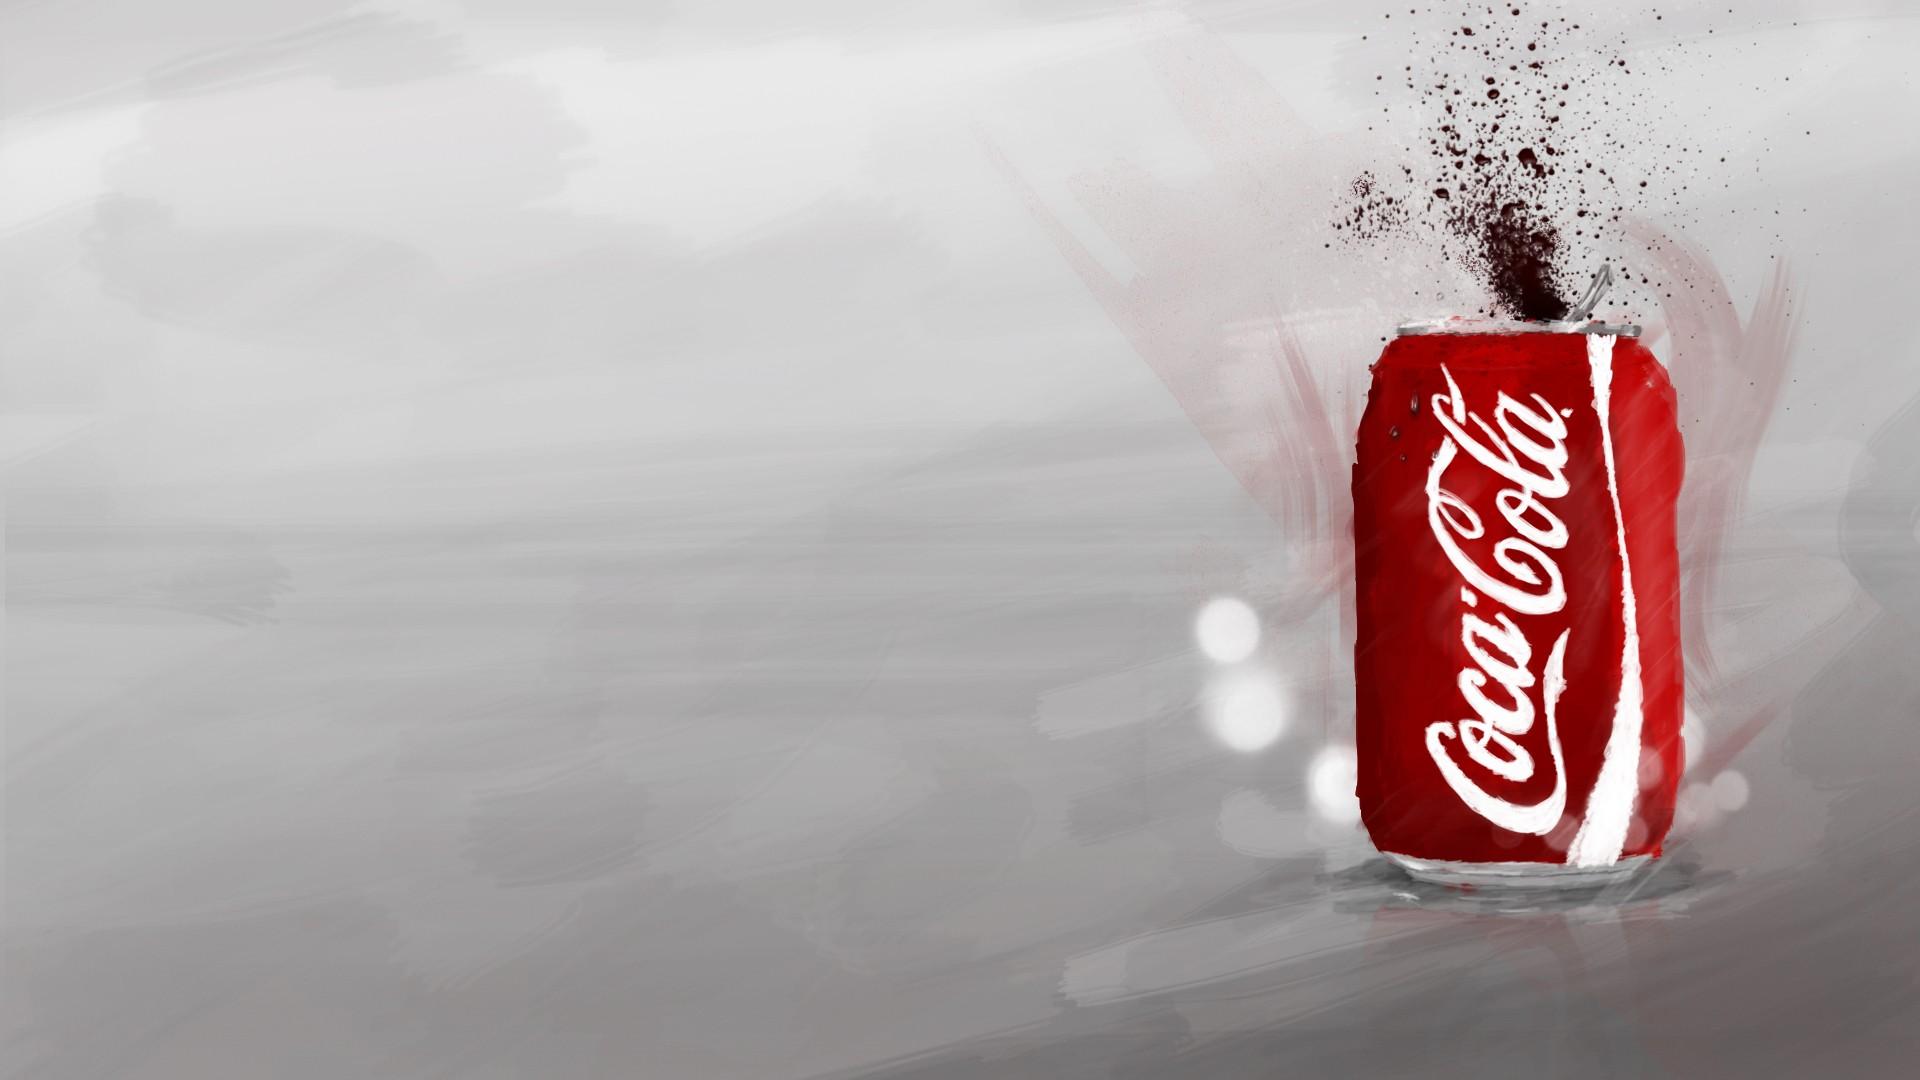 coca cola wallpaper | 1920x1080 | #69277, Modern powerpoint